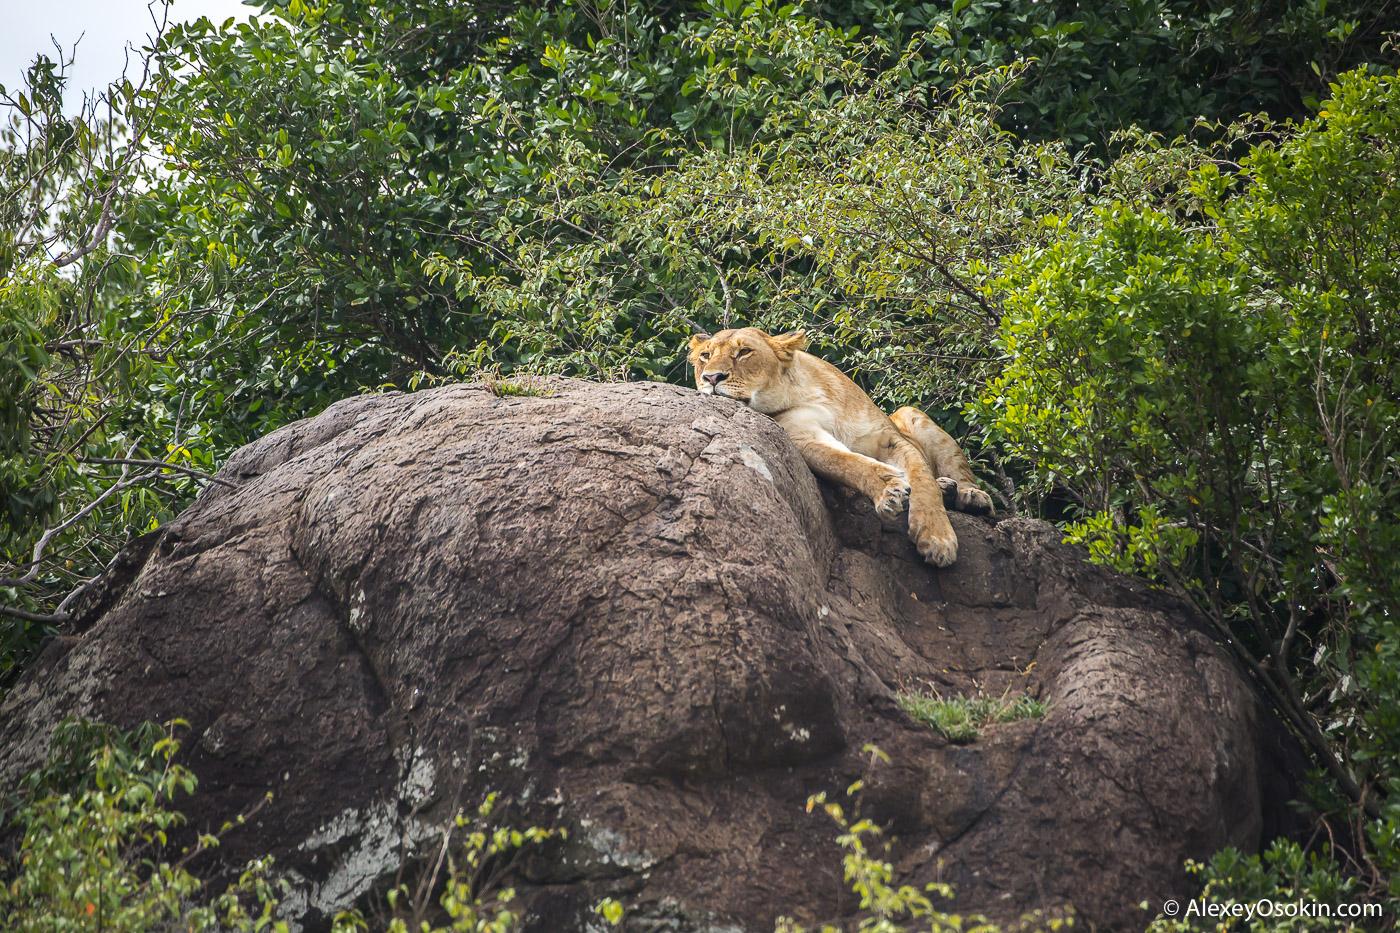 lions_kenya _2015_ao-6.jpg